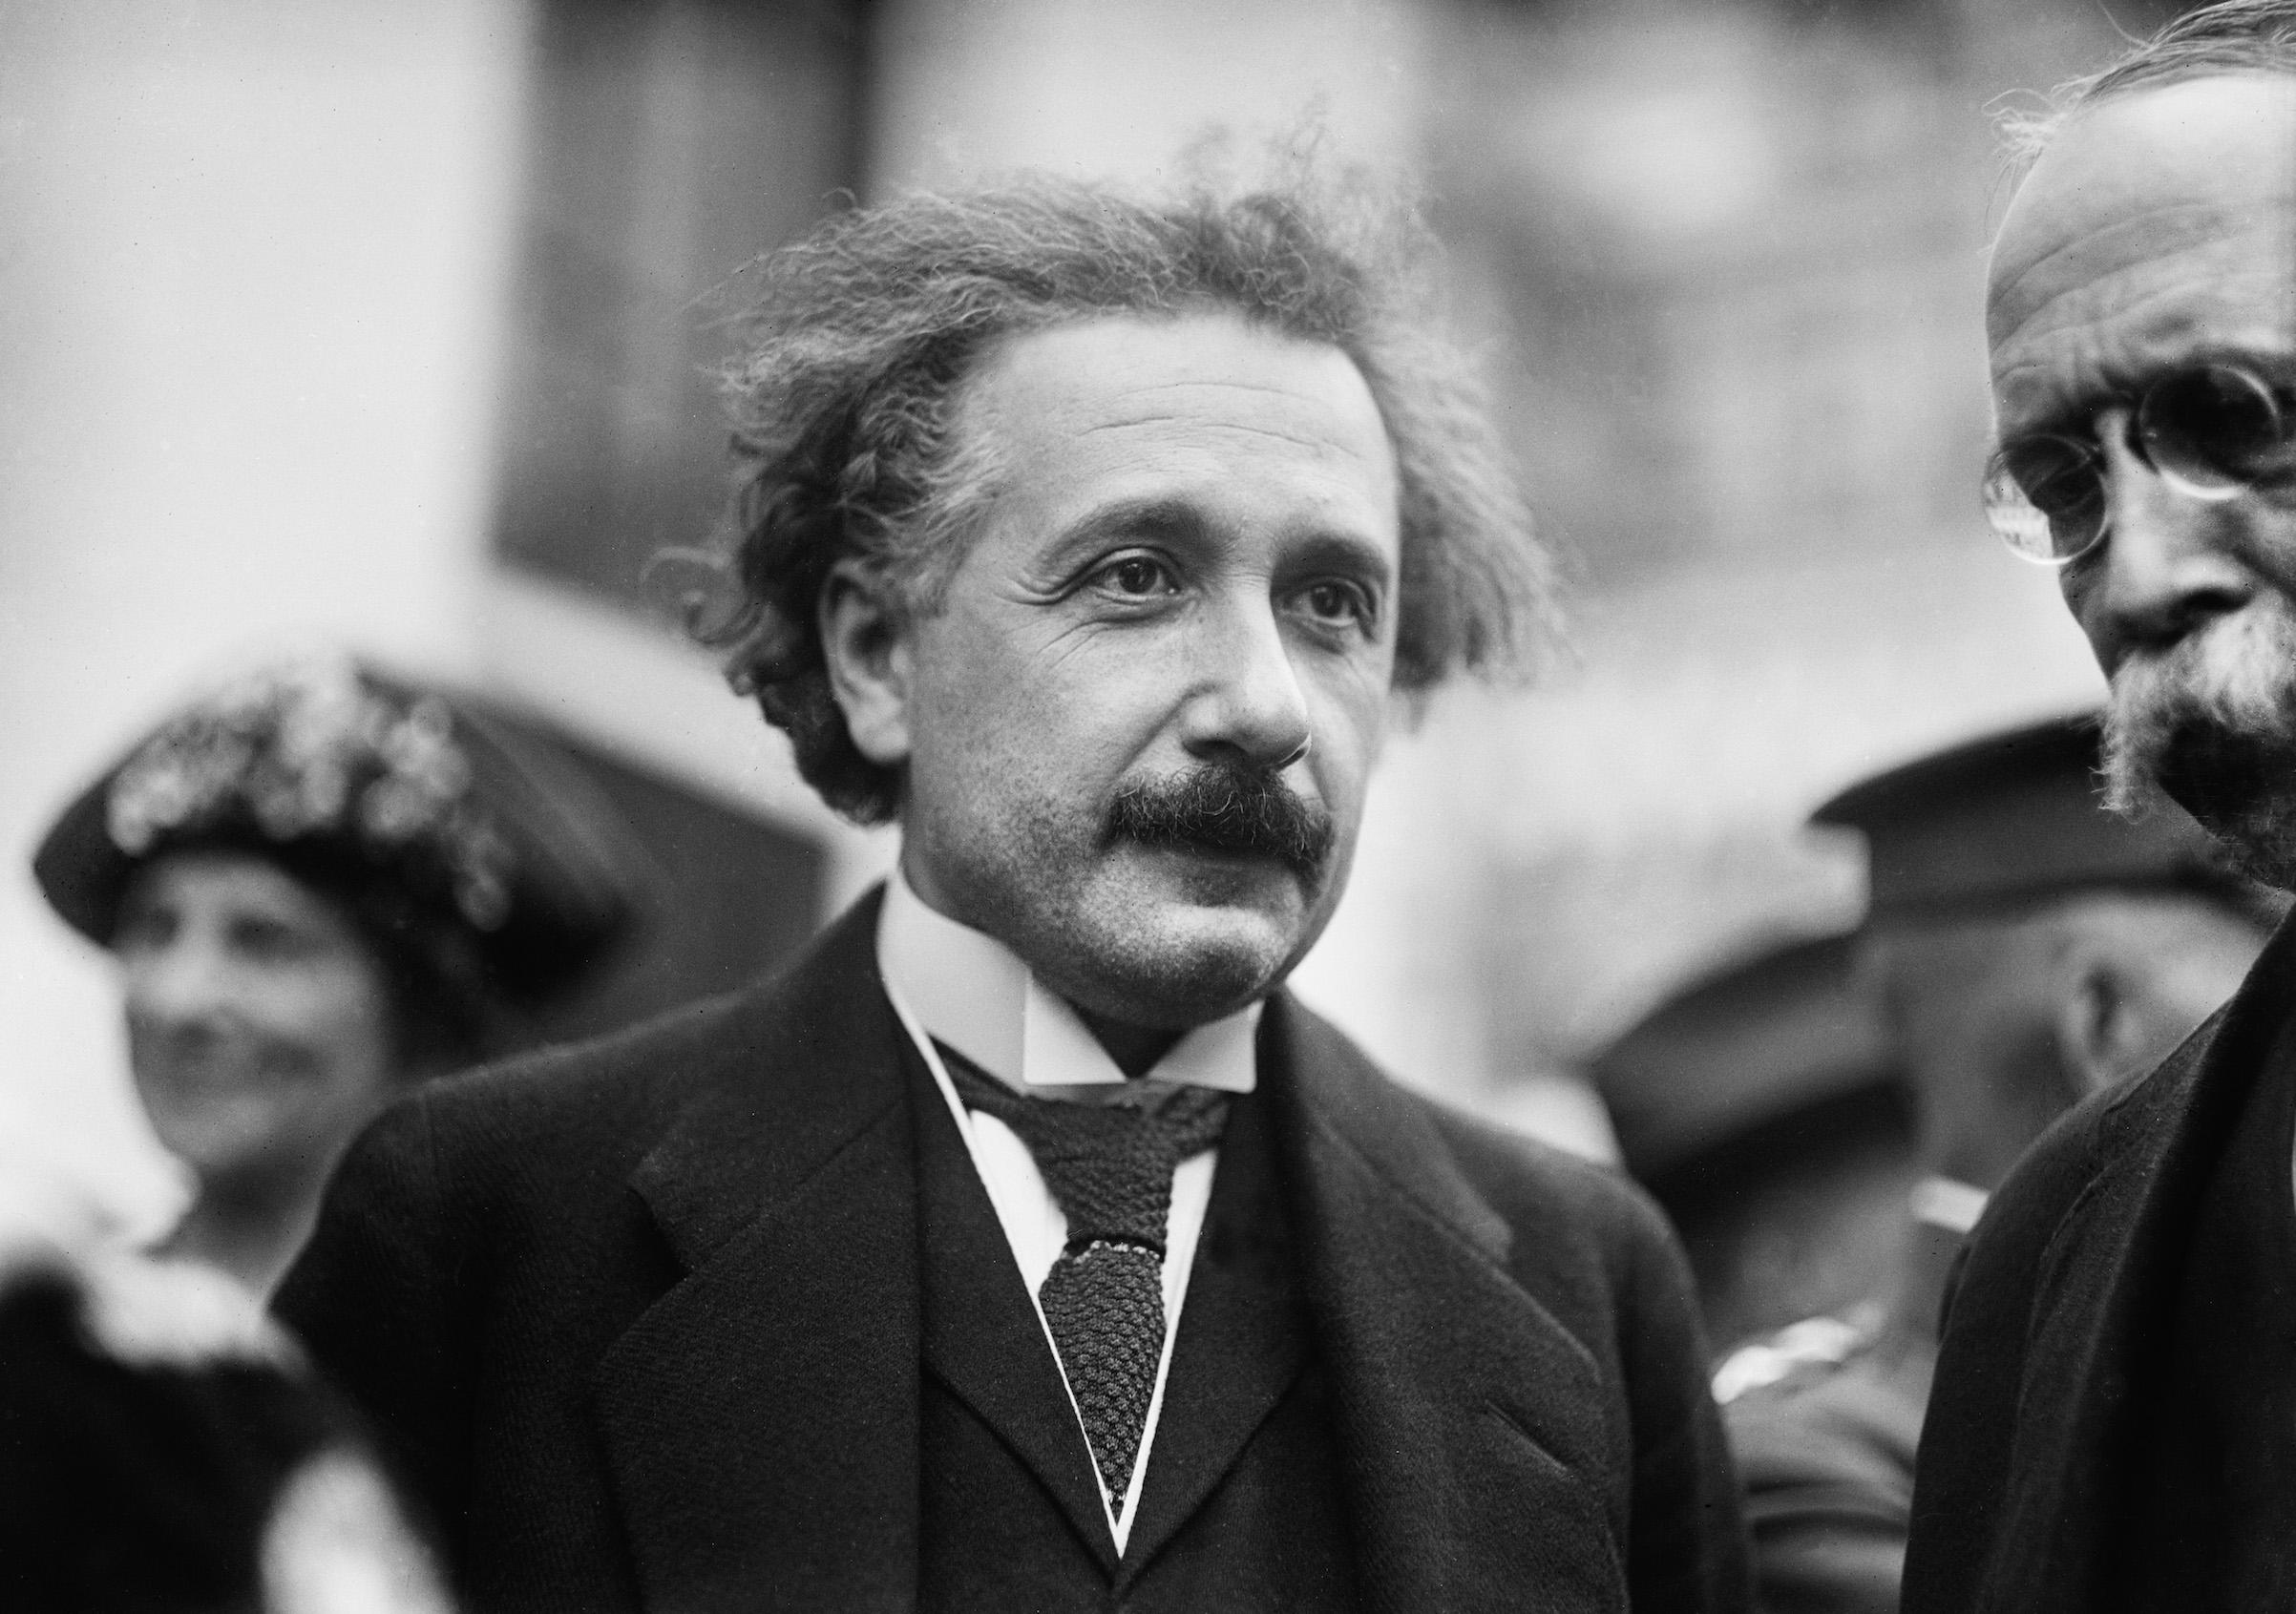 ۵. آلبرت انیشتین (Albert Einstein)